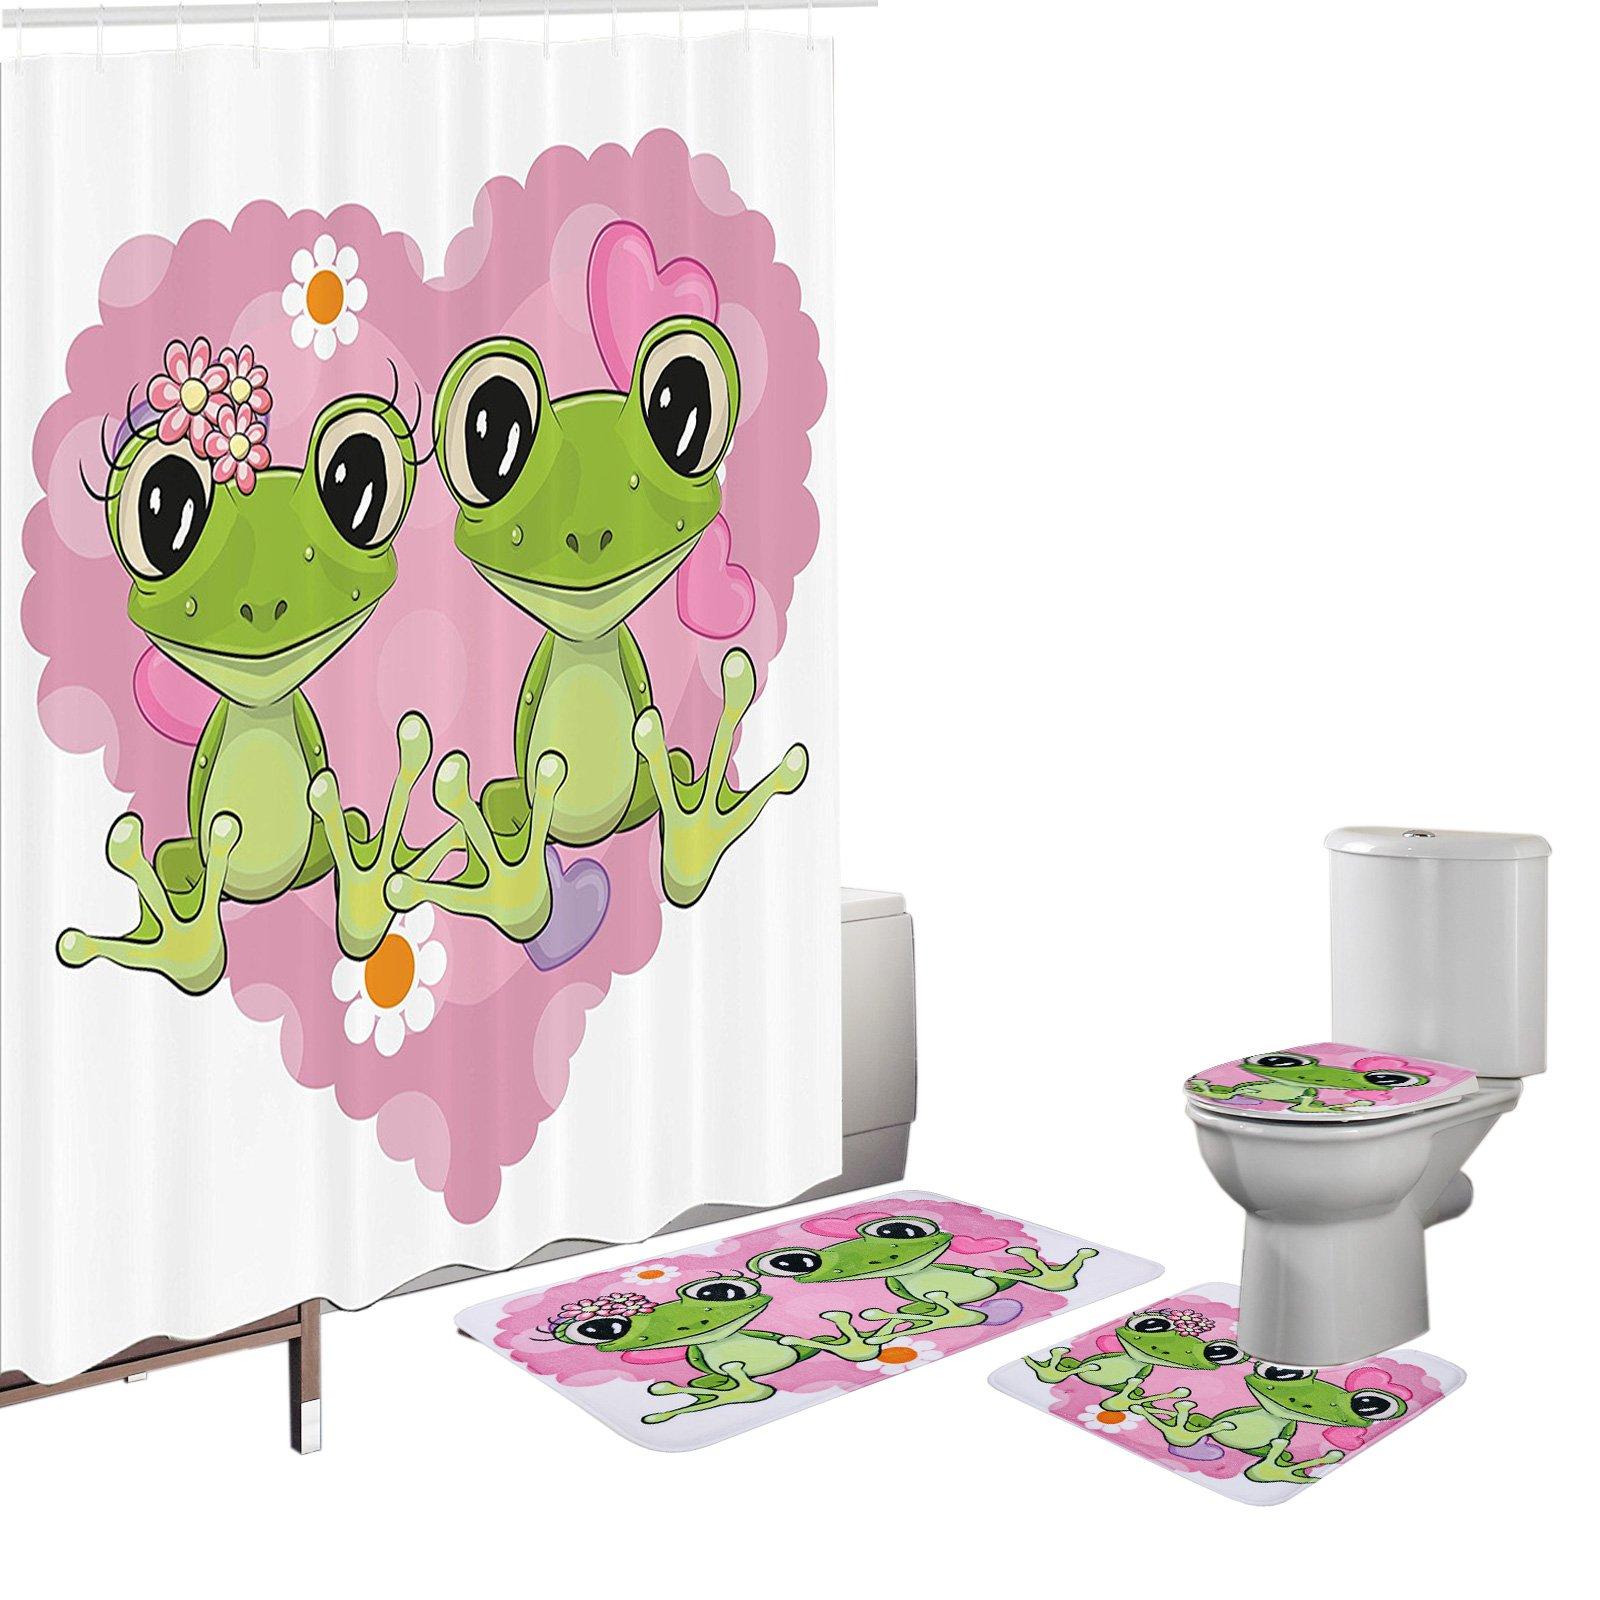 Amagical 16 Pieces Shower Curtain Set Bath Mat Set Contour Mat Toilet Cover Cute Frog Animal Lovers Shower Curtain with 12 hooks